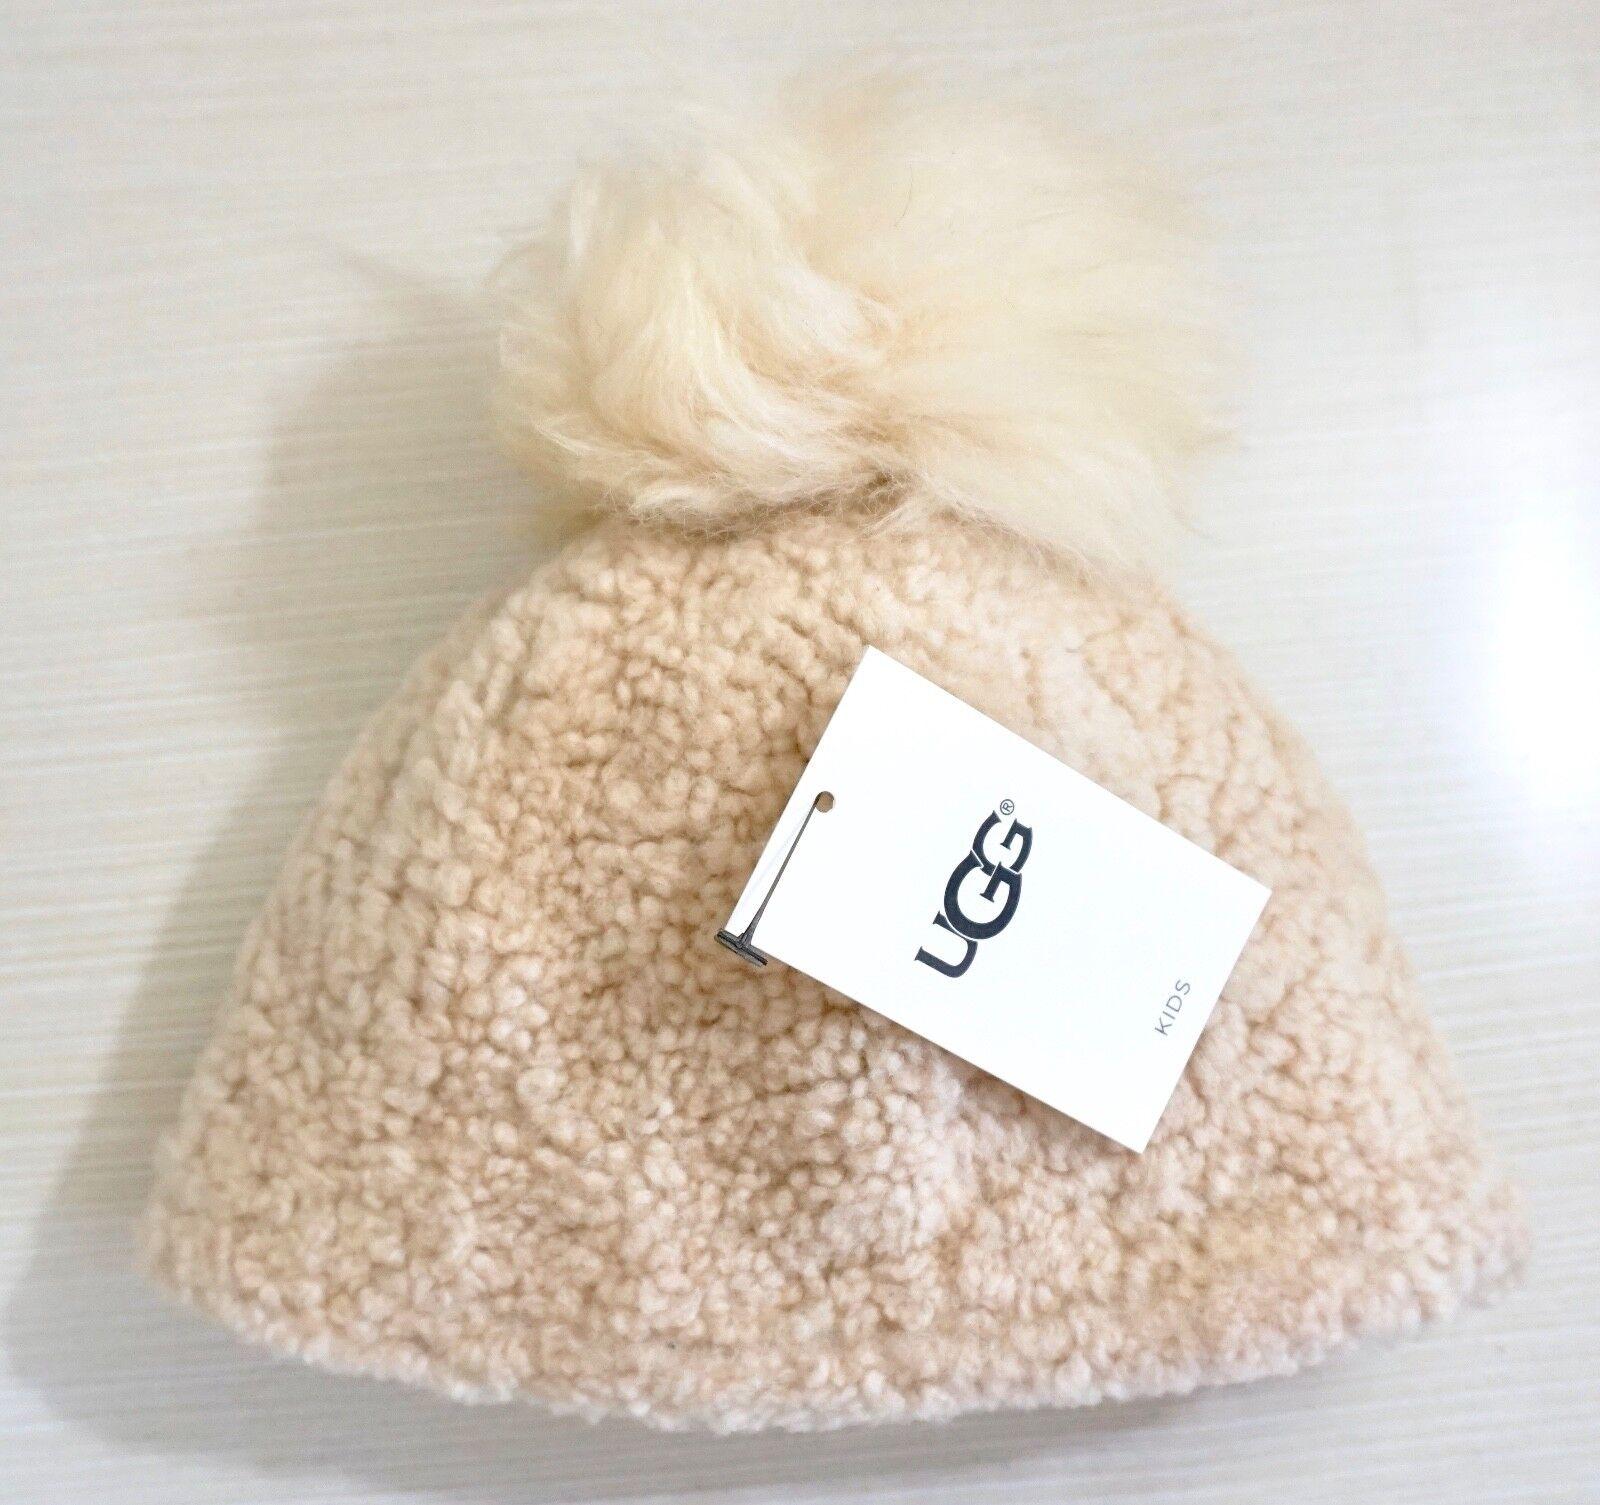 95 $ UGG Australia - Bonnet en peau de mouton, Alezan, Taille 2-4 ans